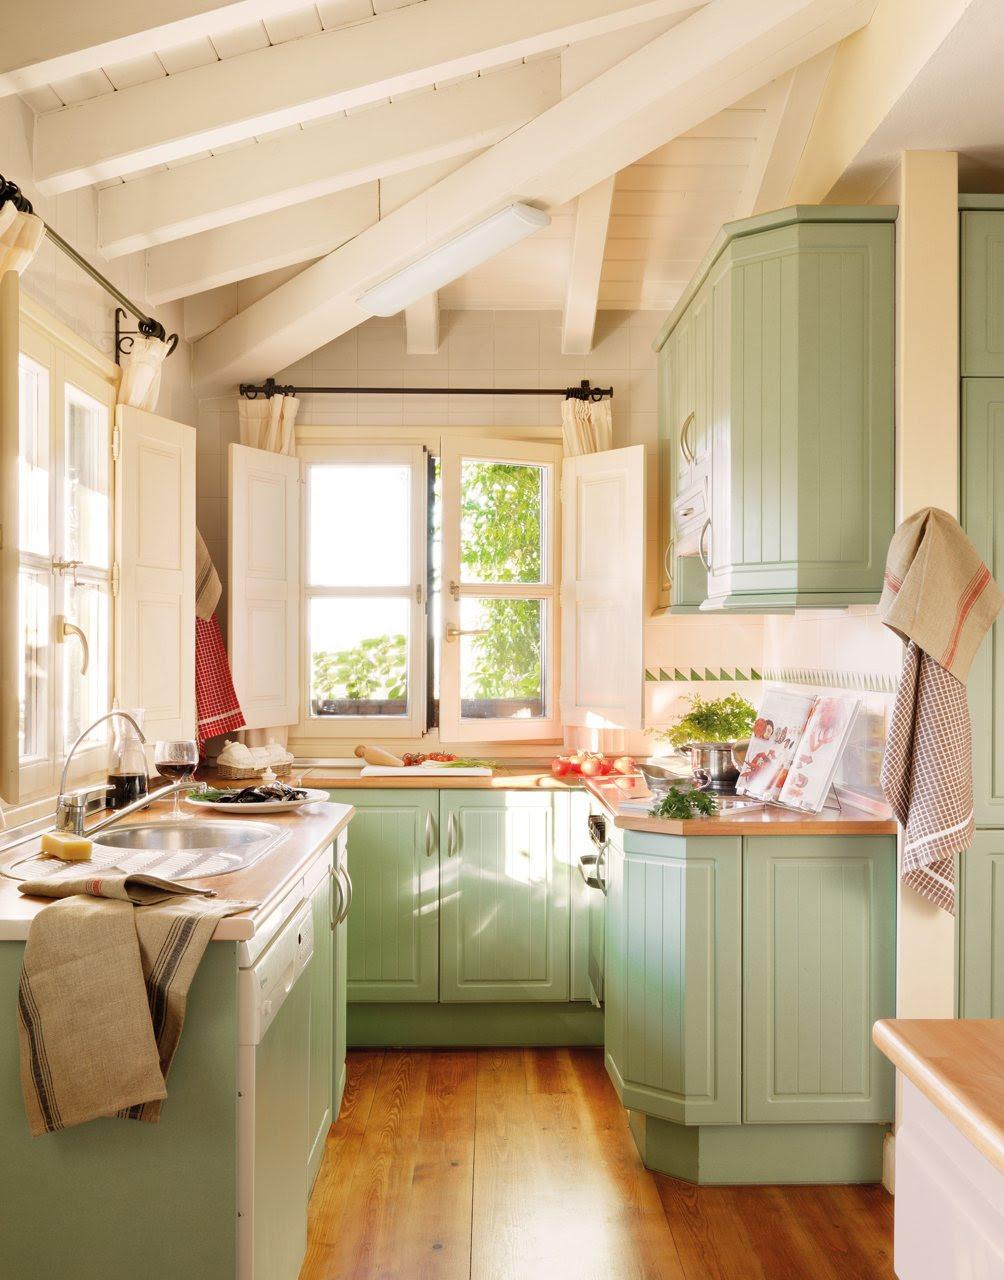 cocina de madera en verde. Pequeña cocina con armarios en verde claro